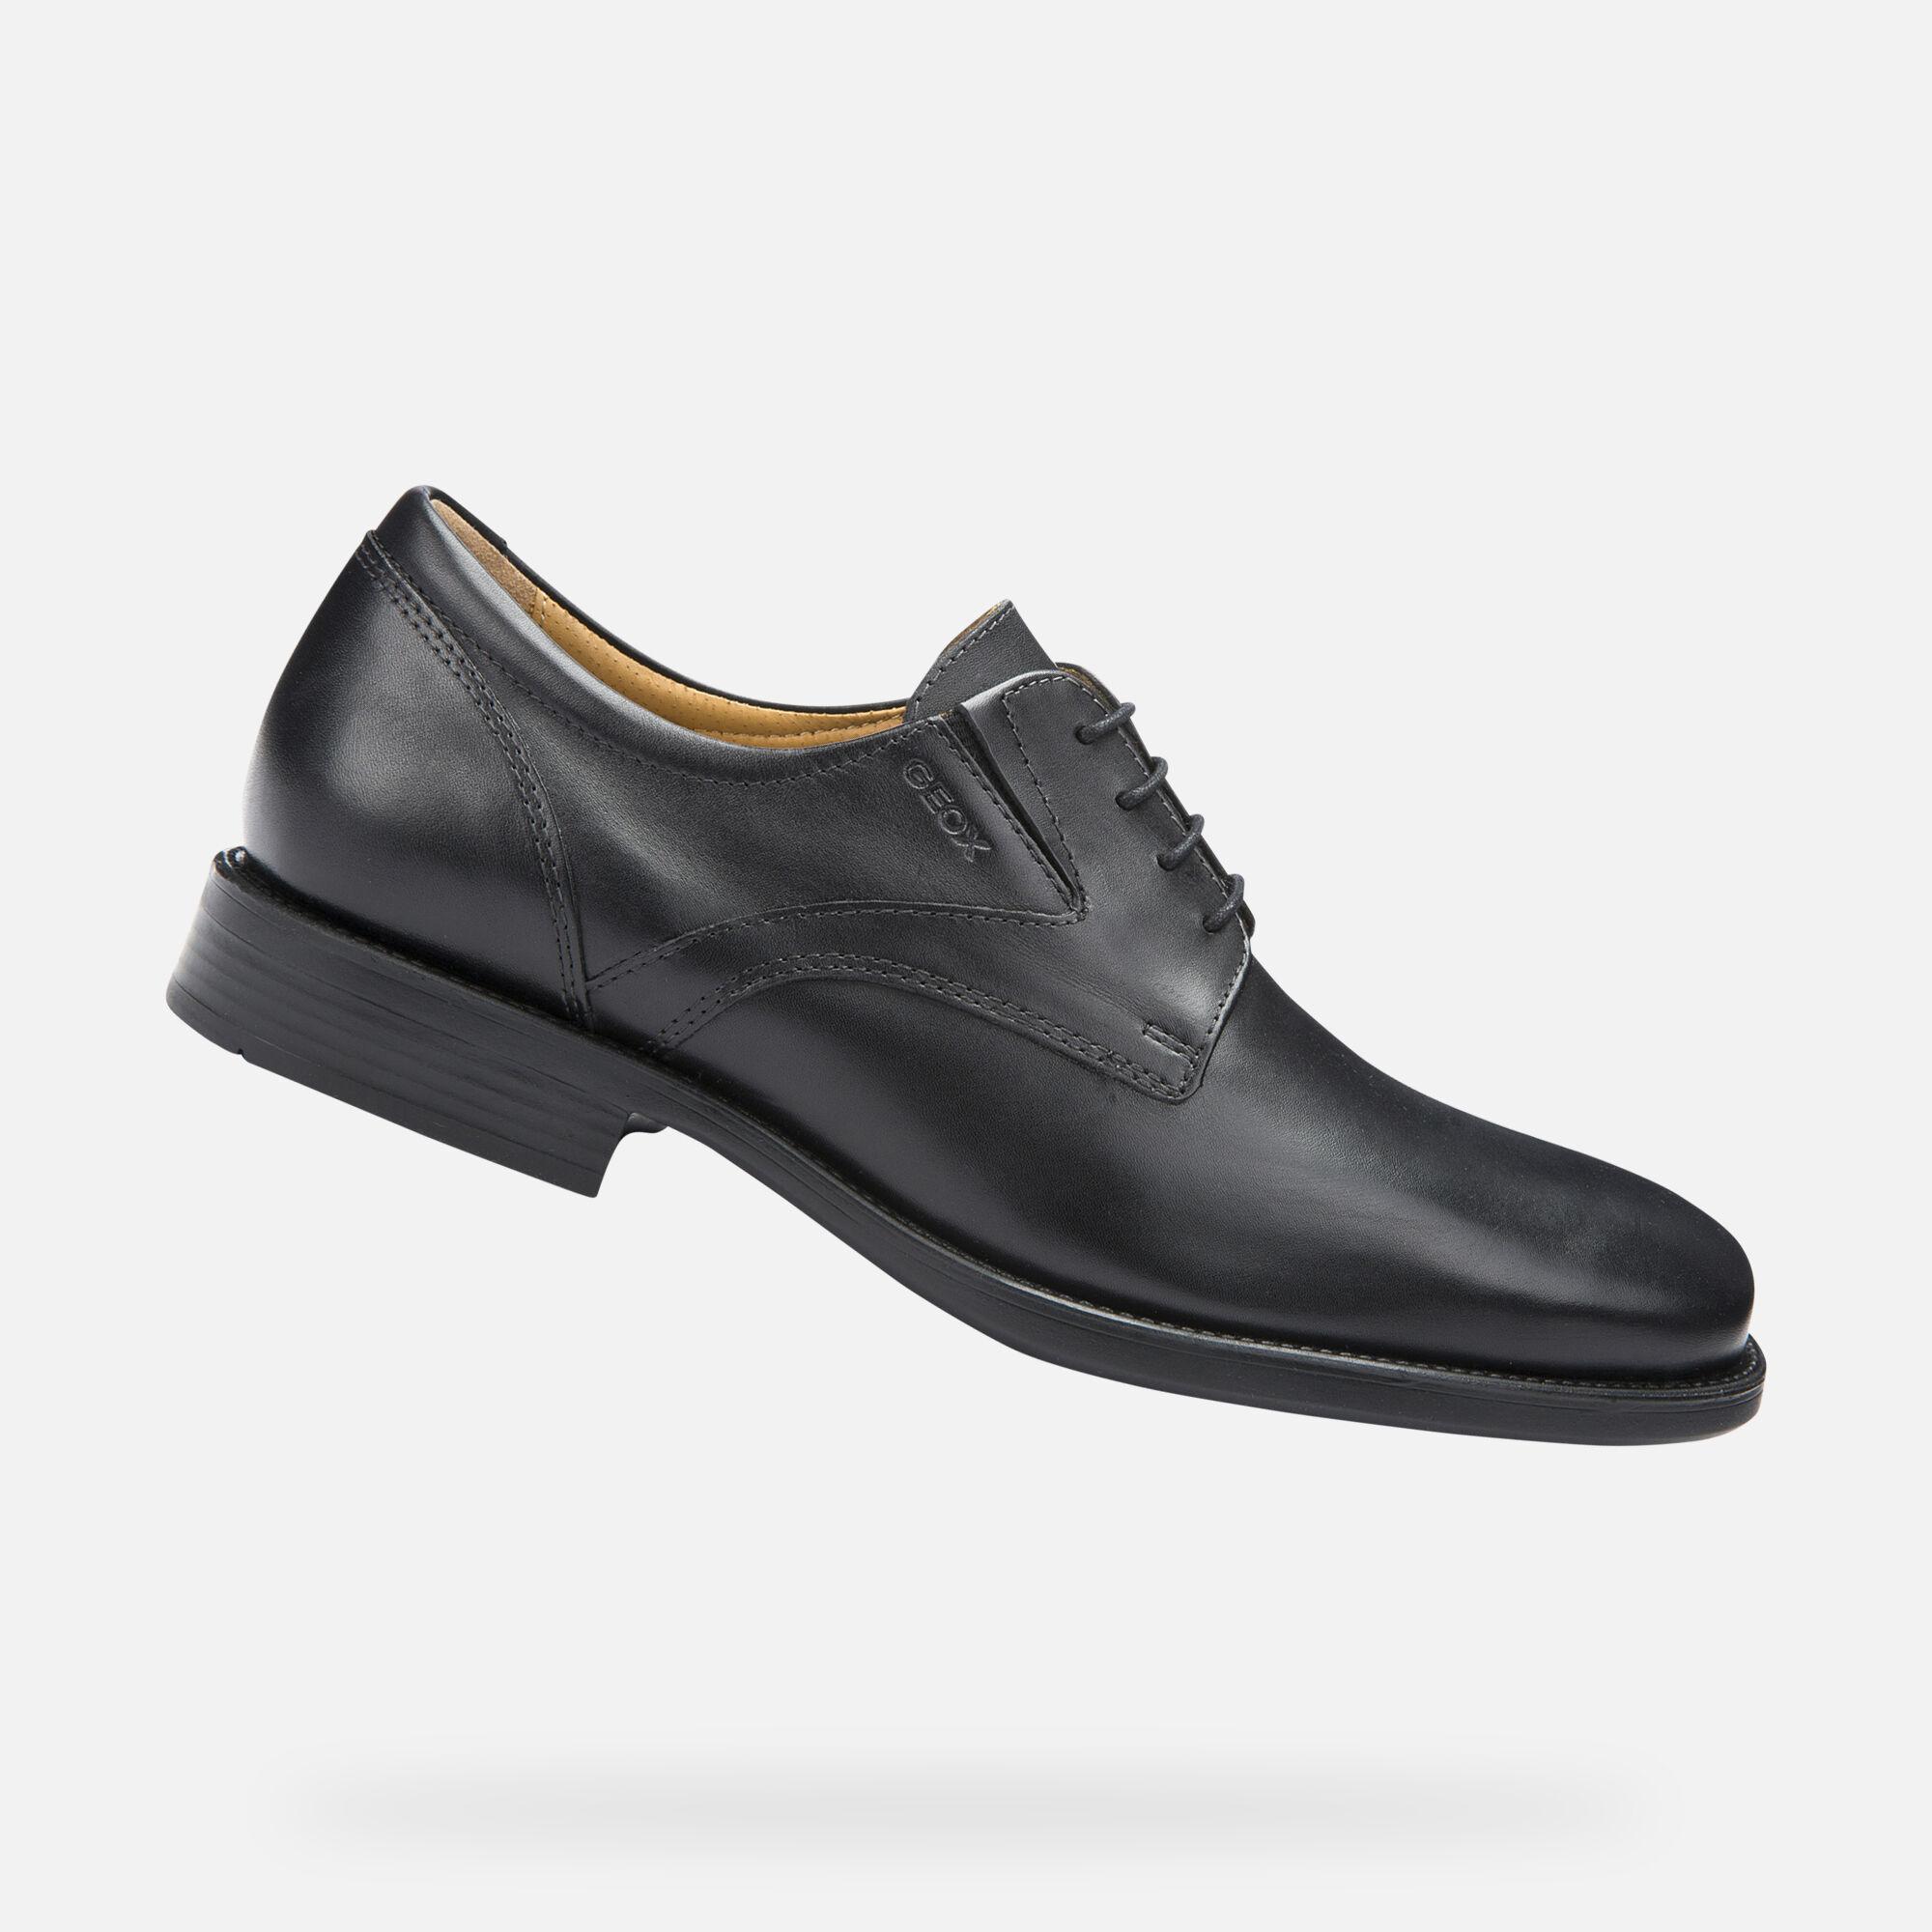 GEOX Sneakers Nero Uomo Scarpe Sneakers,geox scarpe,Italia